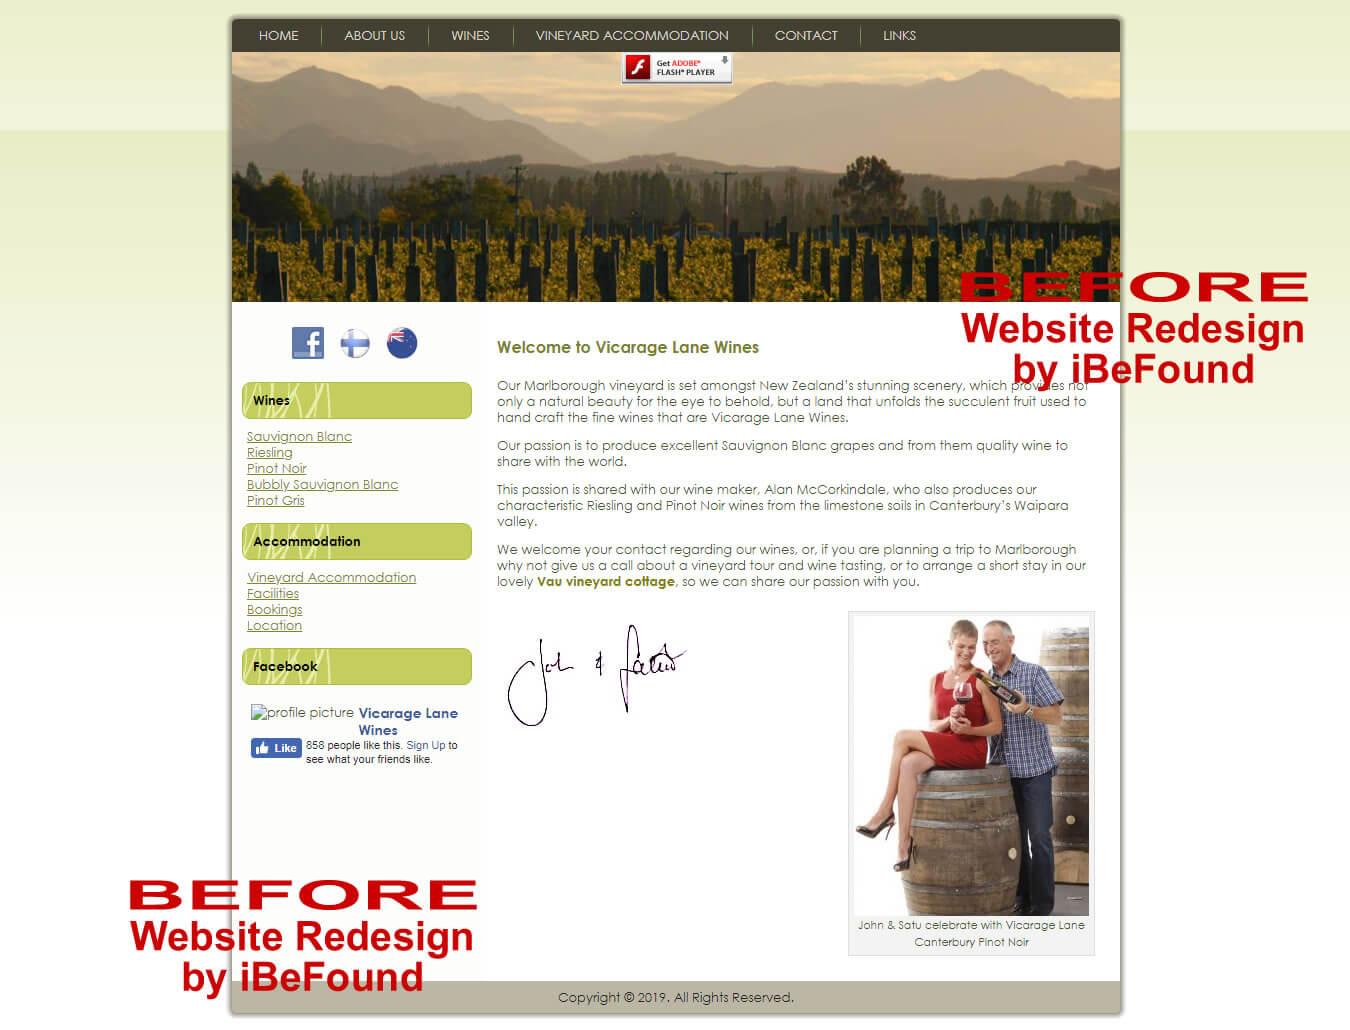 Homepage Of Vicarage Lane Wines Before Website Redesign By IBeFound Digital Marketing